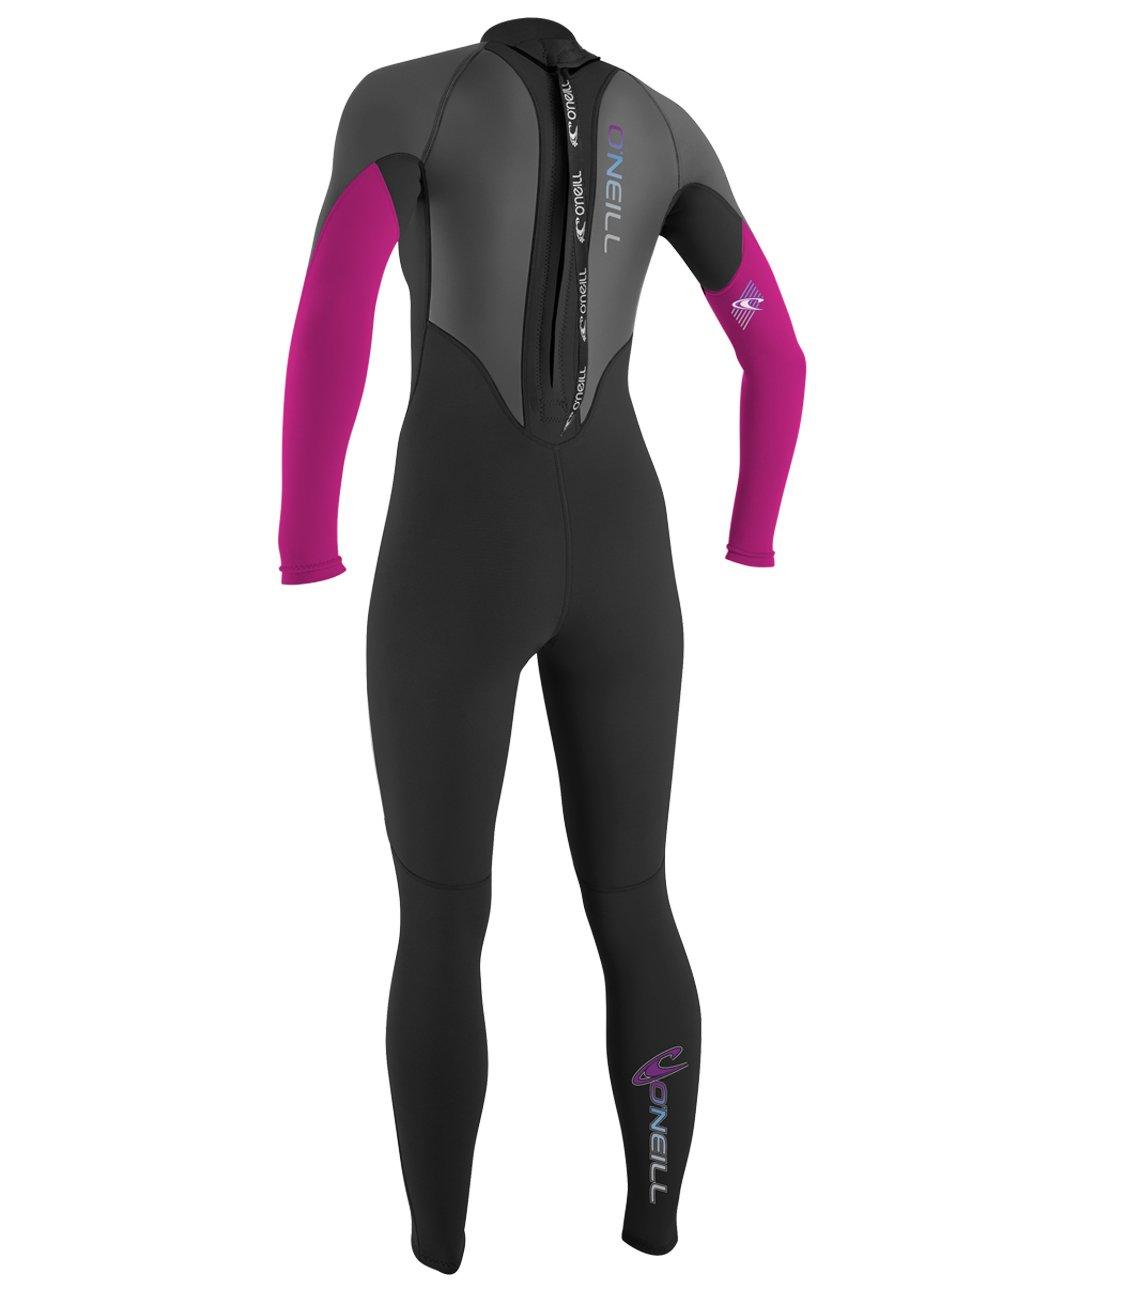 O'Neill Wetsuits Women's Reactor 3/2mm Back Zip Full Wetsuit by O'Neill Wetsuits (Image #2)